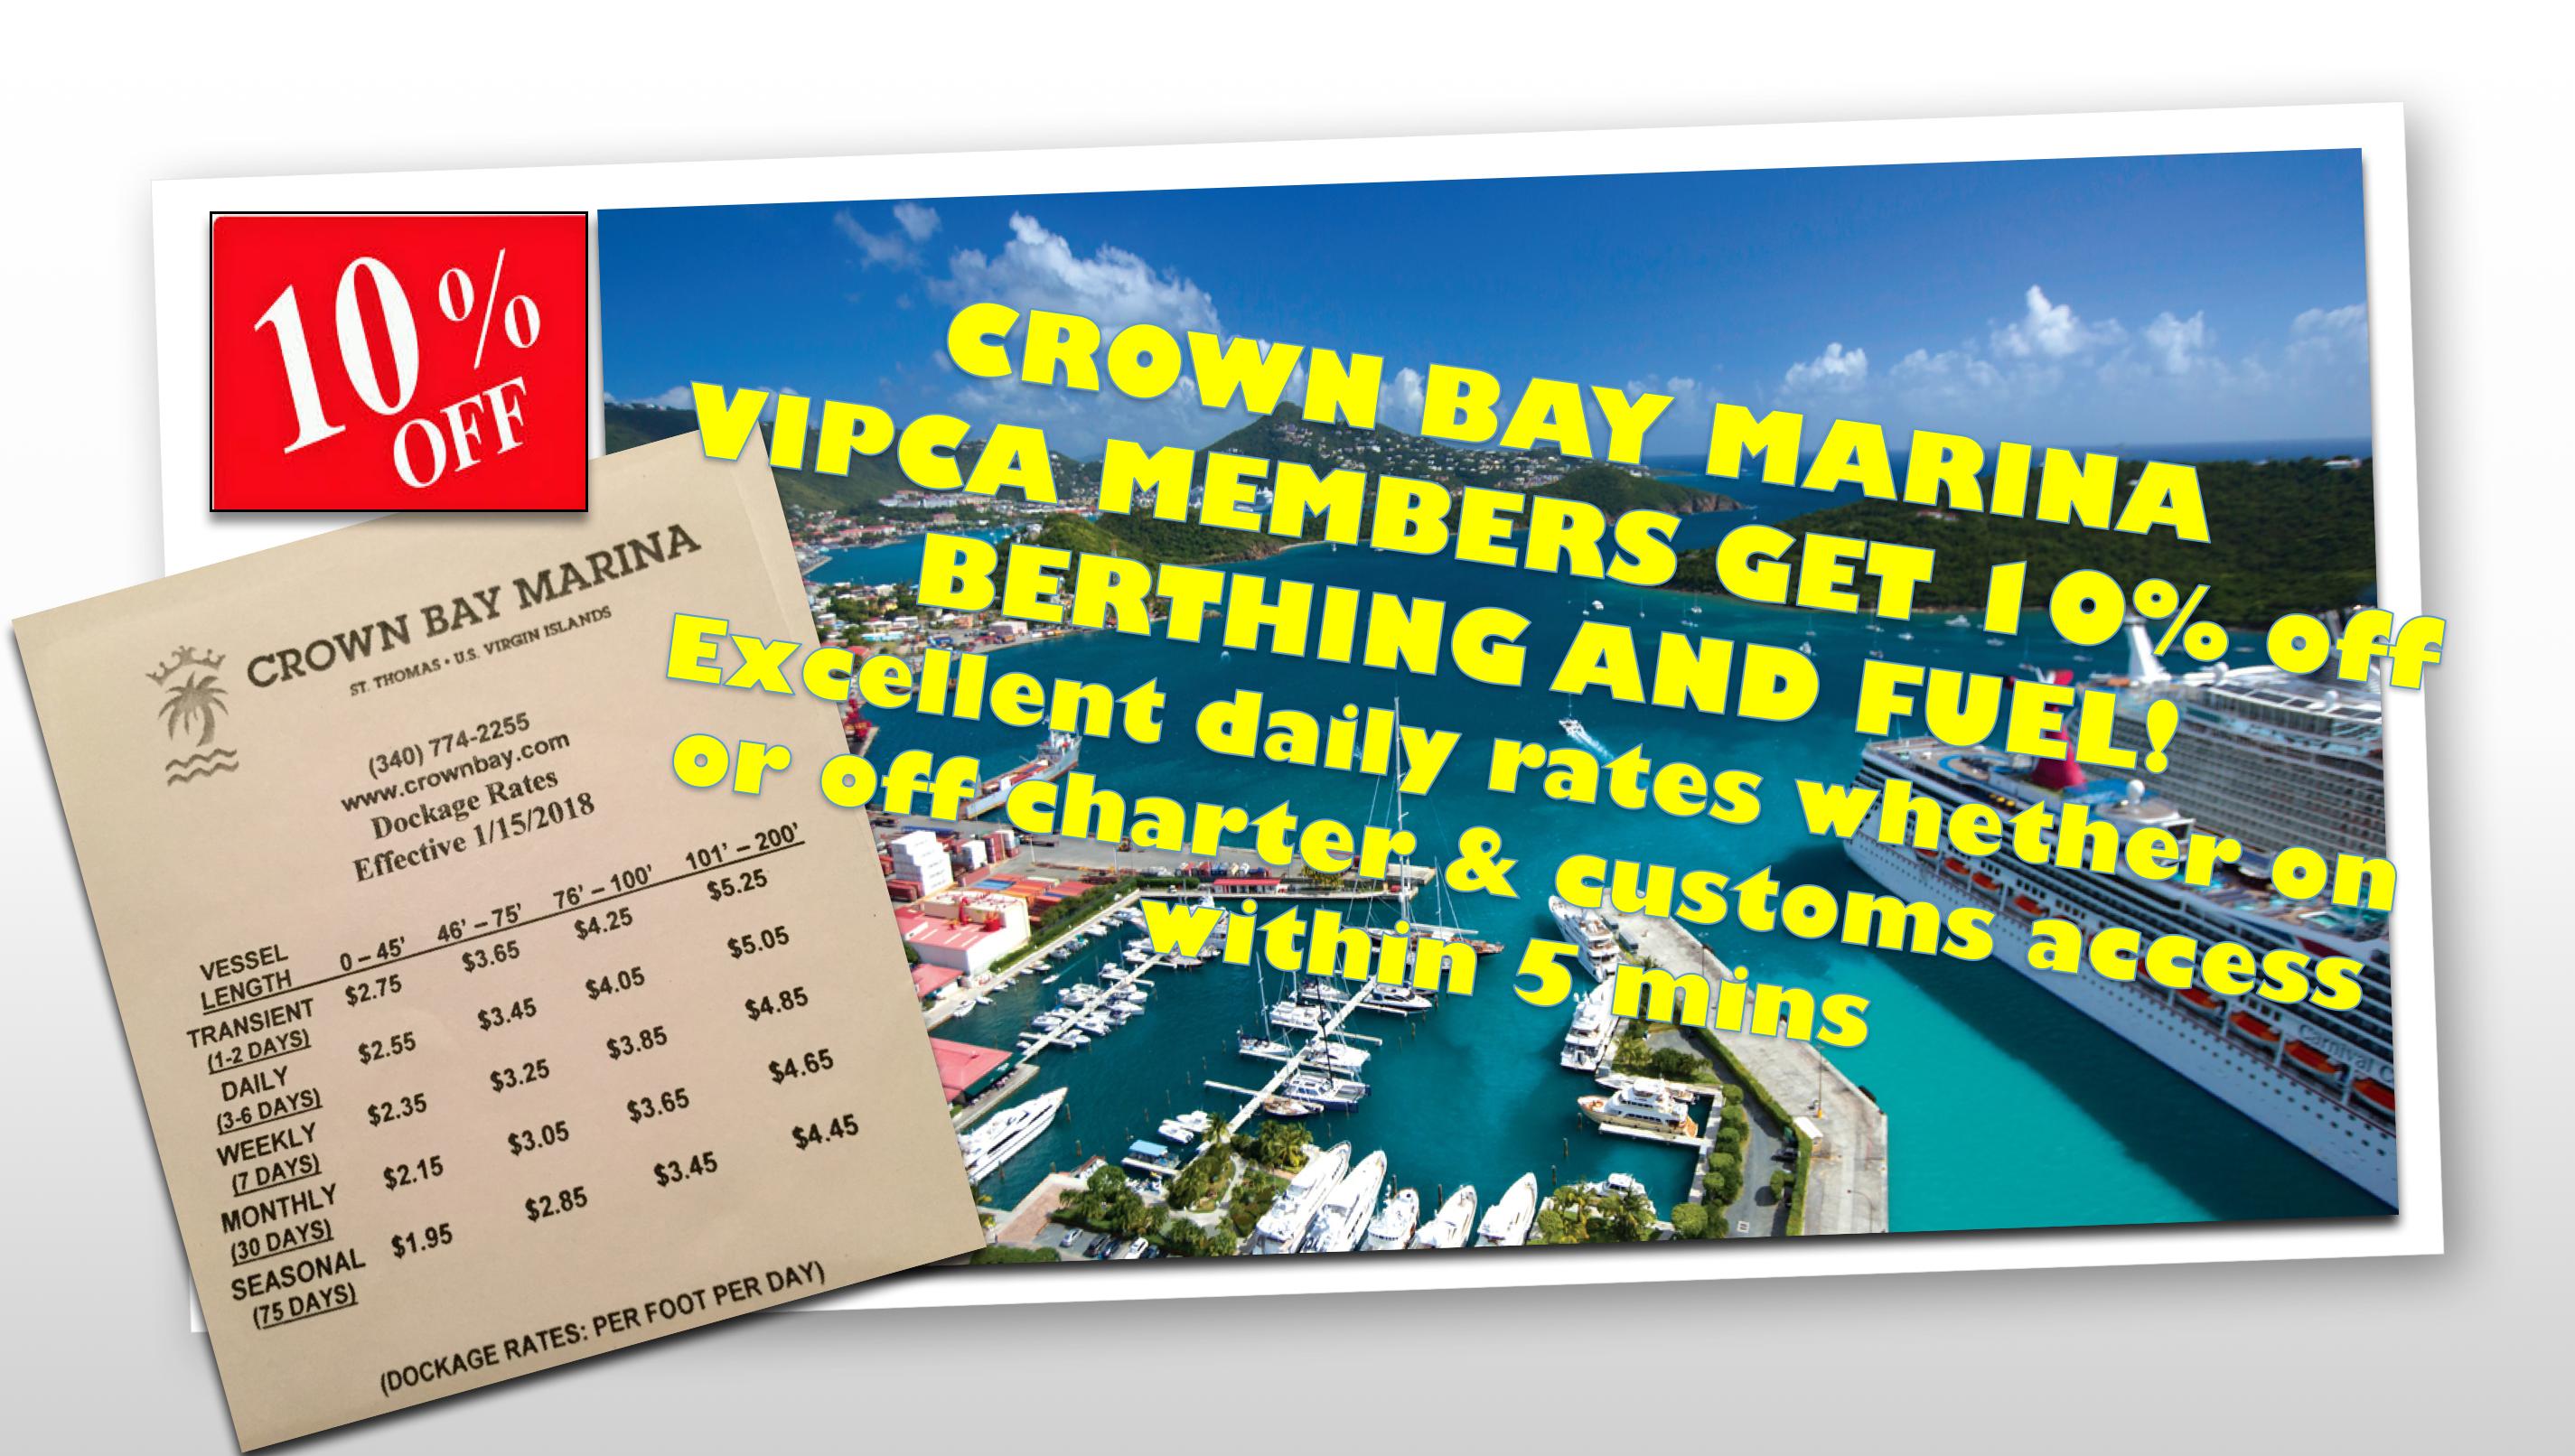 Crown Bay VIPCA discounts